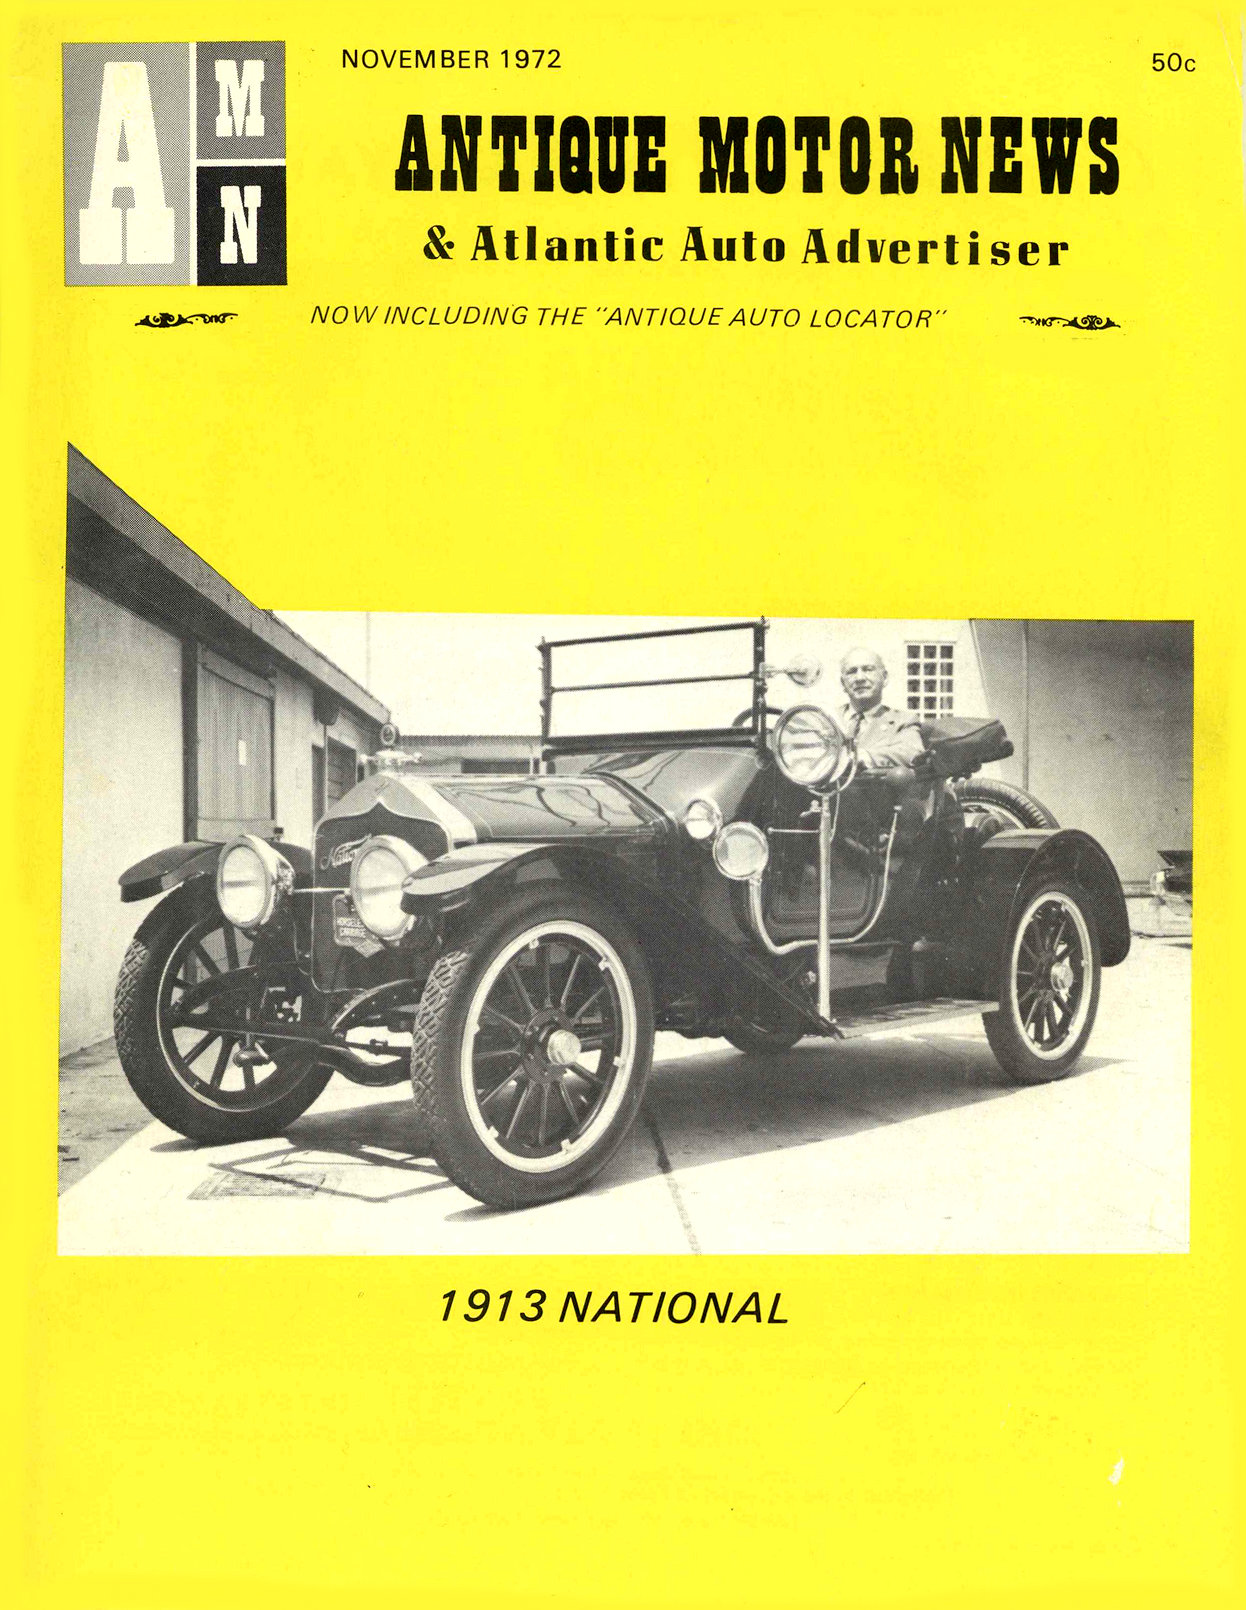 1913 NATIONAL ANTIQUE MOTOR NEWS & Atlantic Auto Advertiser November 1972 8.25″x10.25 Front cover